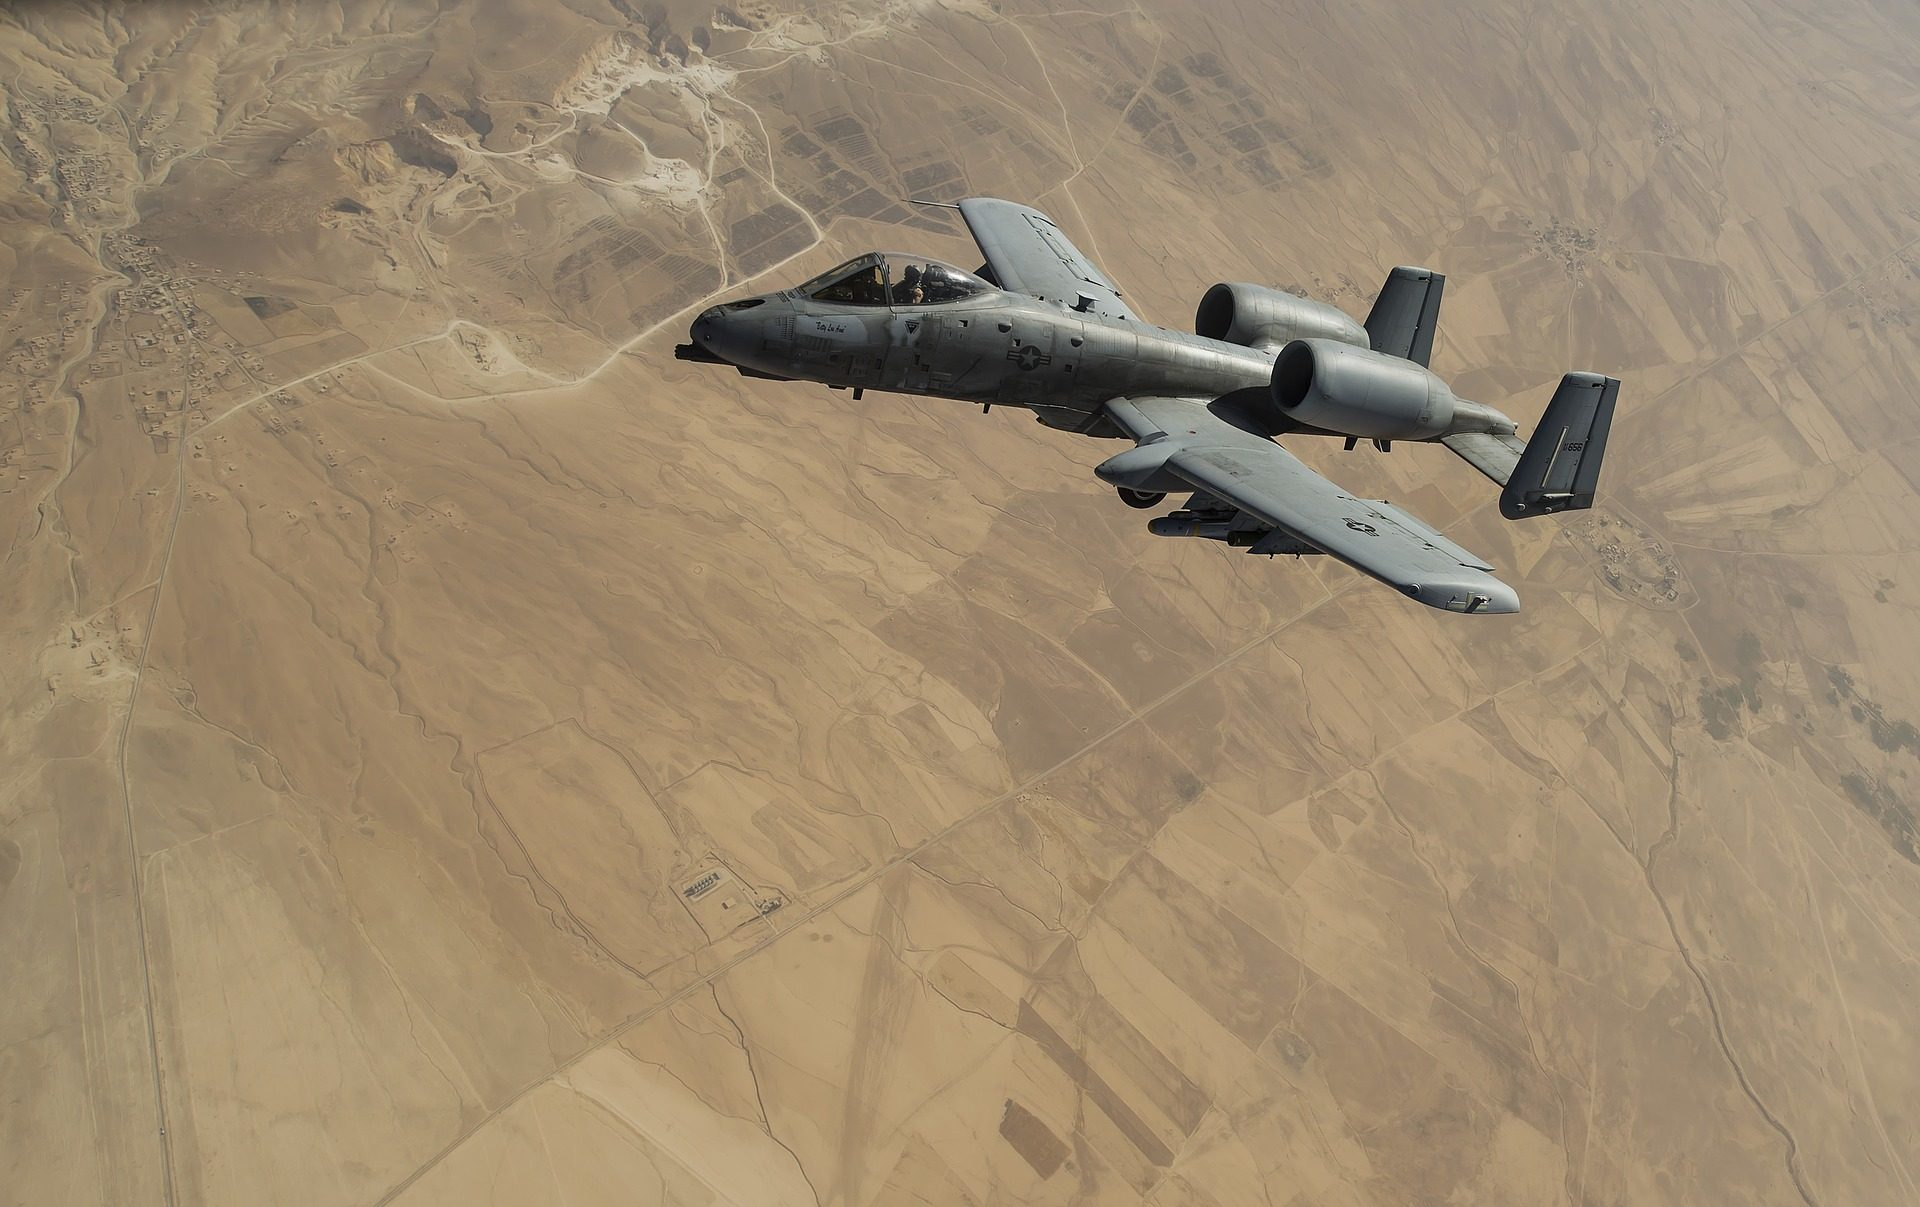 warthog, विमान, सैन्य, सेना, नौसेना - HD वॉलपेपर - प्रोफेसर-falken.com